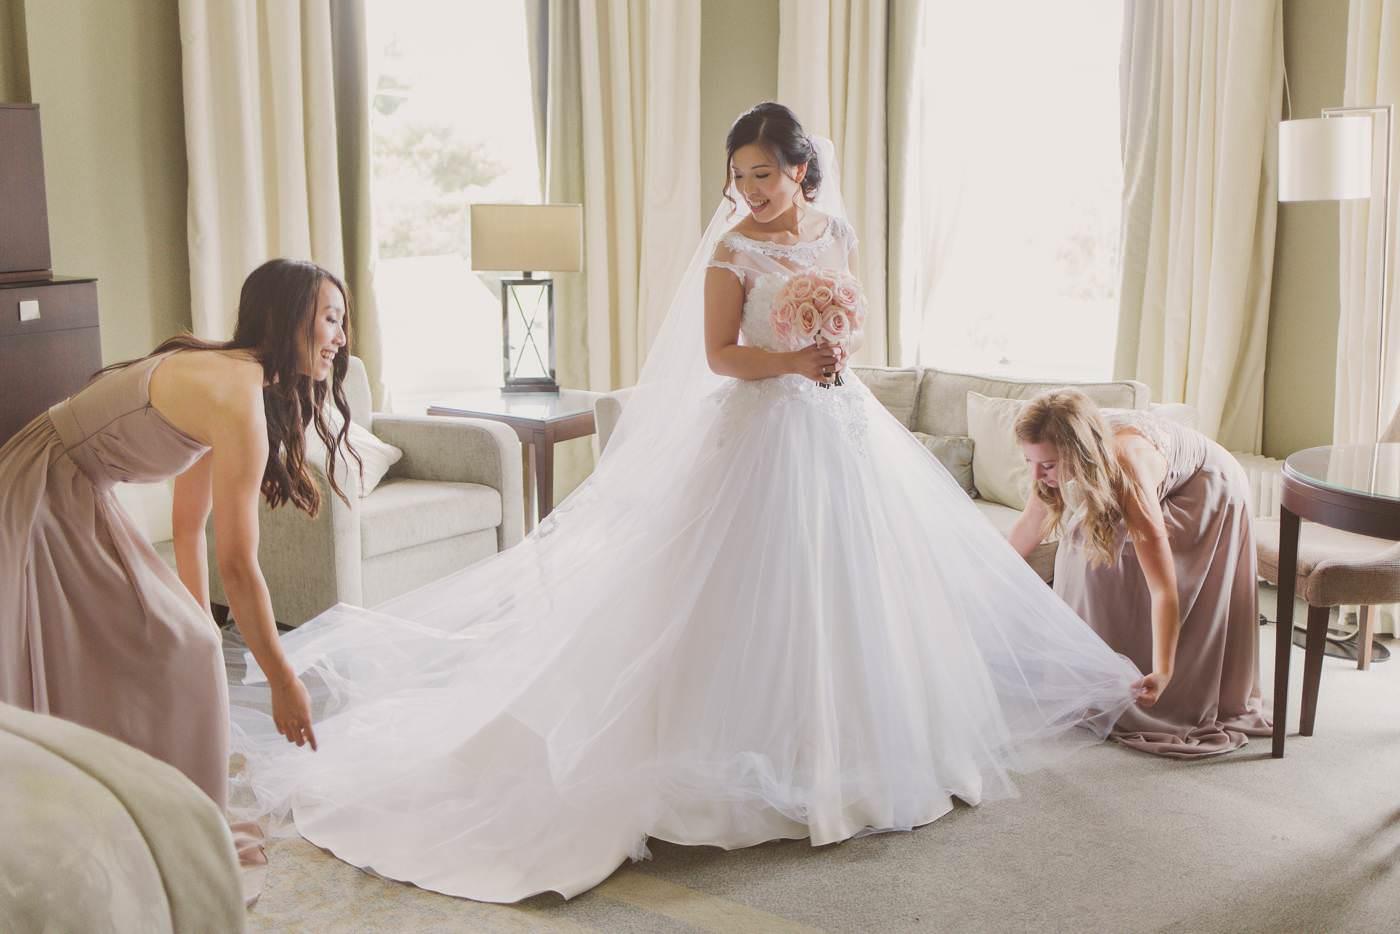 bridesmaids adjust the wedding dress